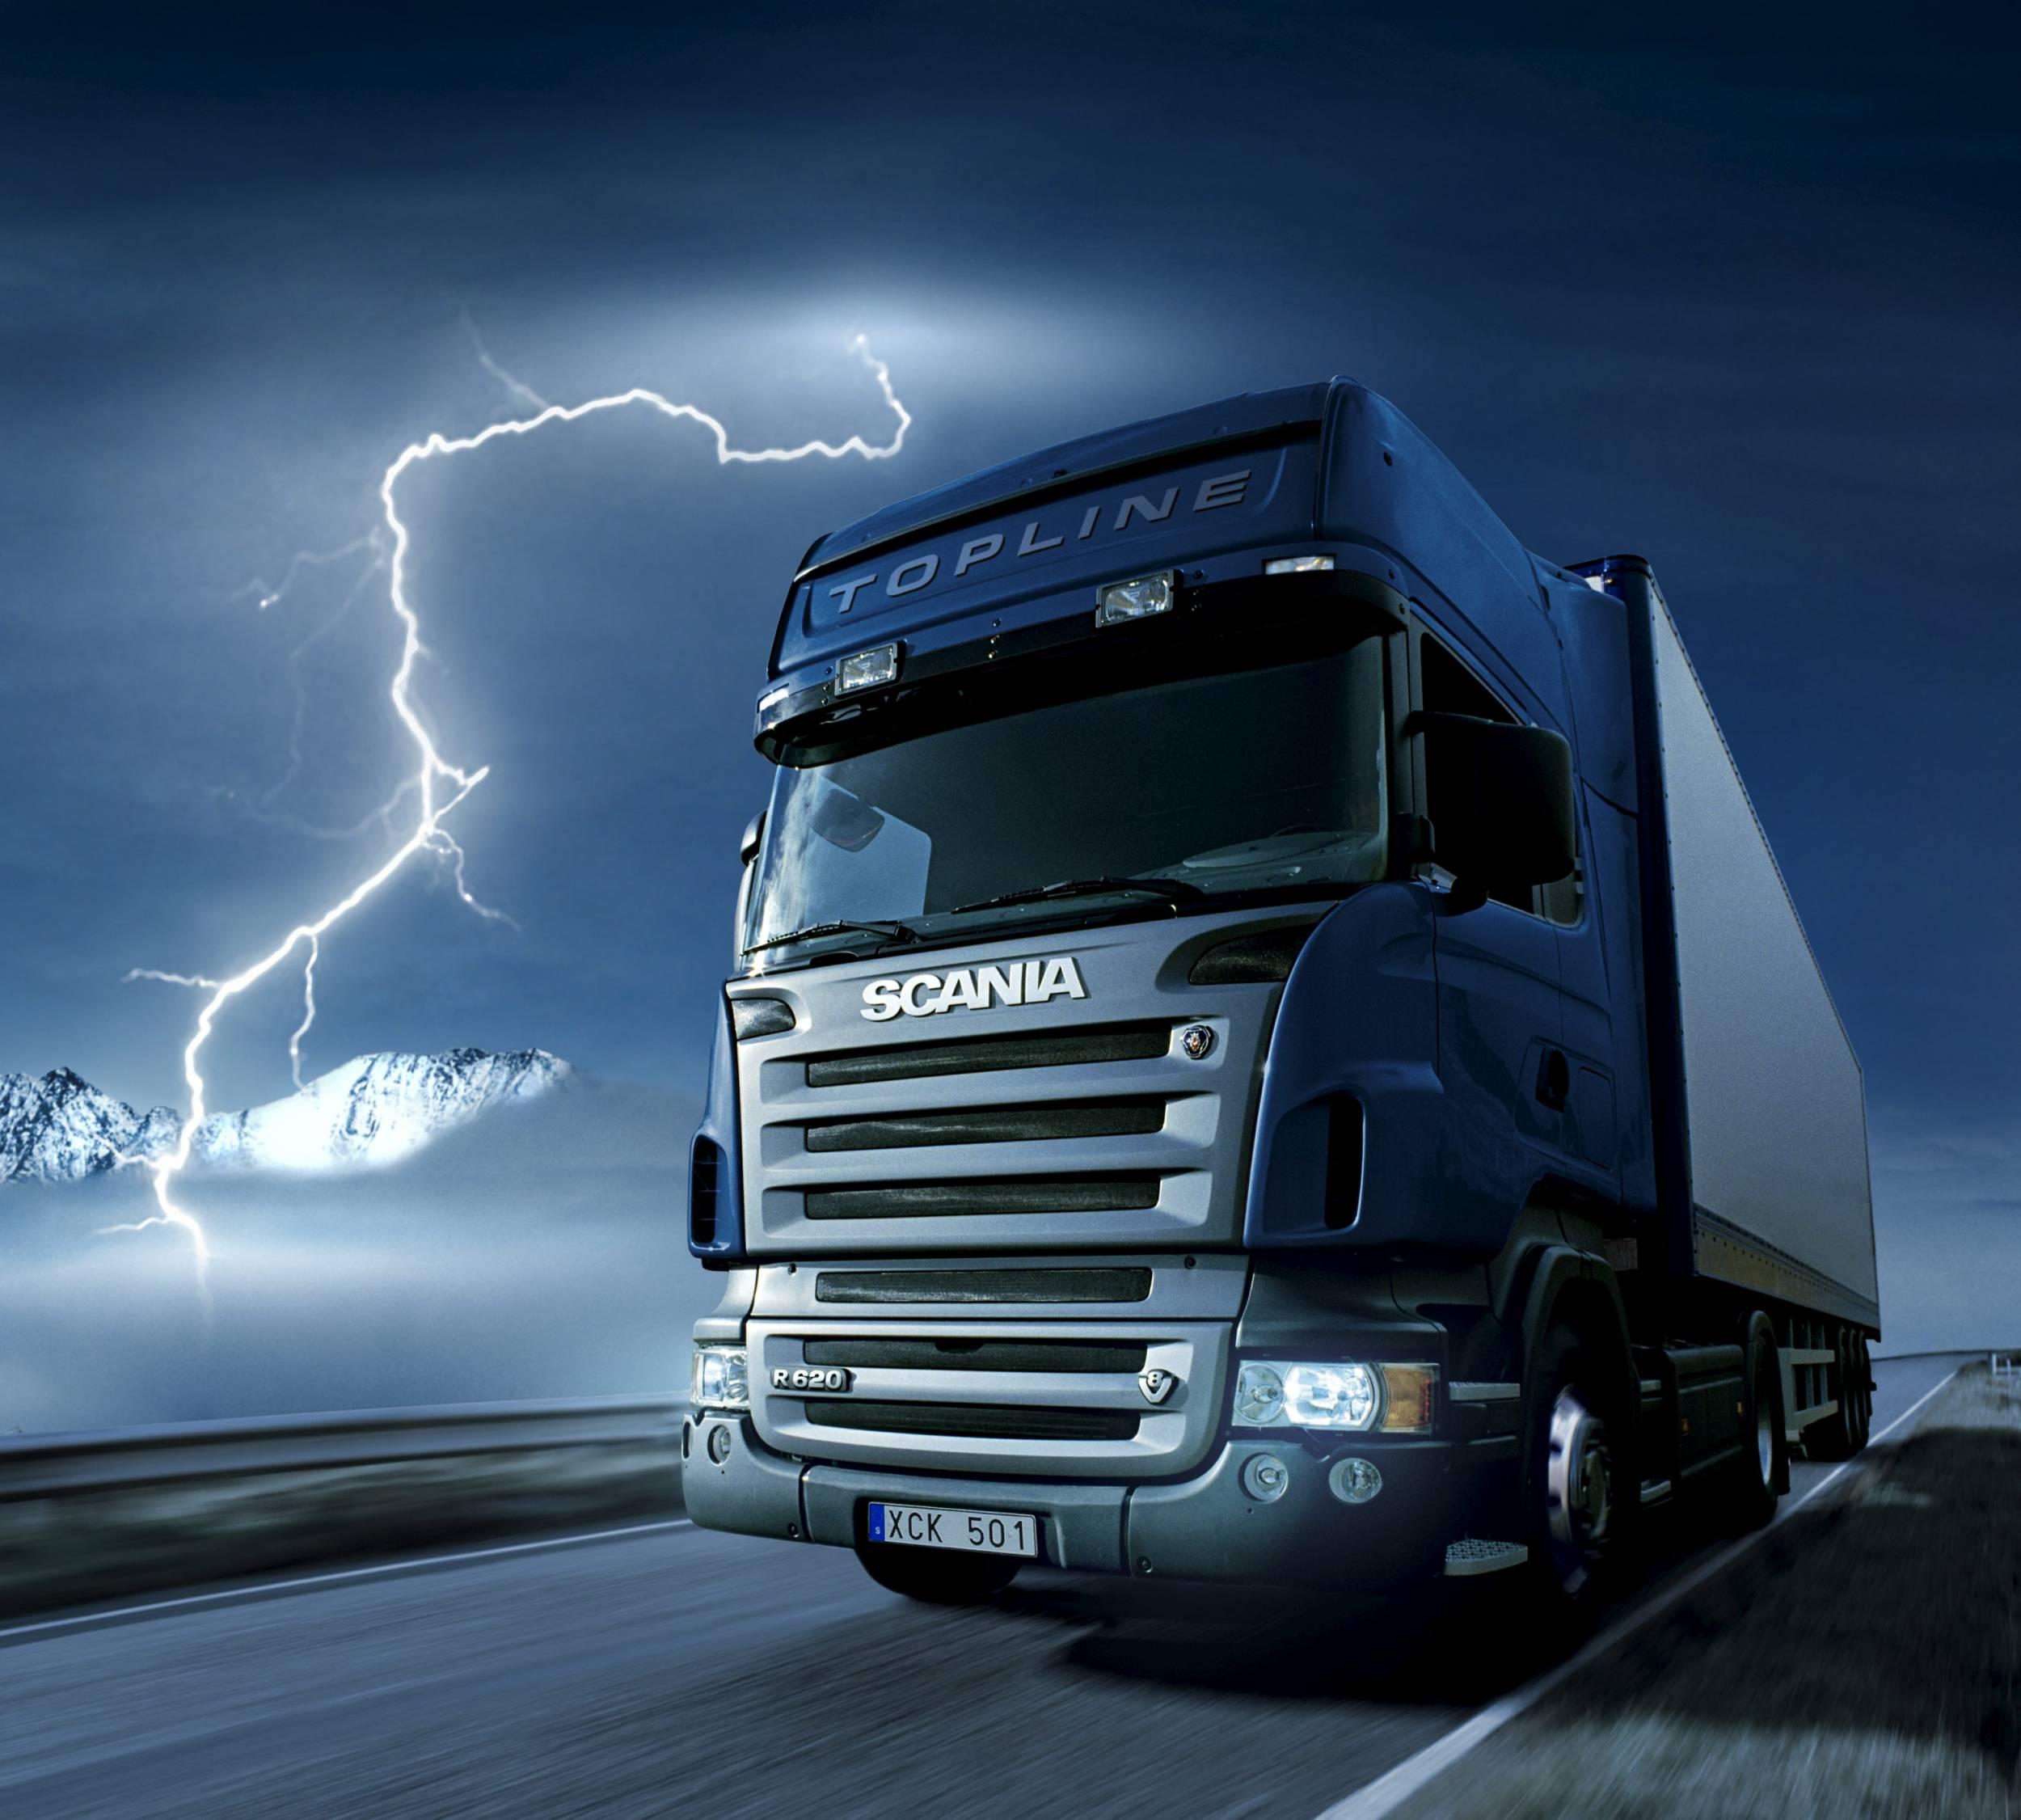 Truck Wallpapers - Top Free Truck ...